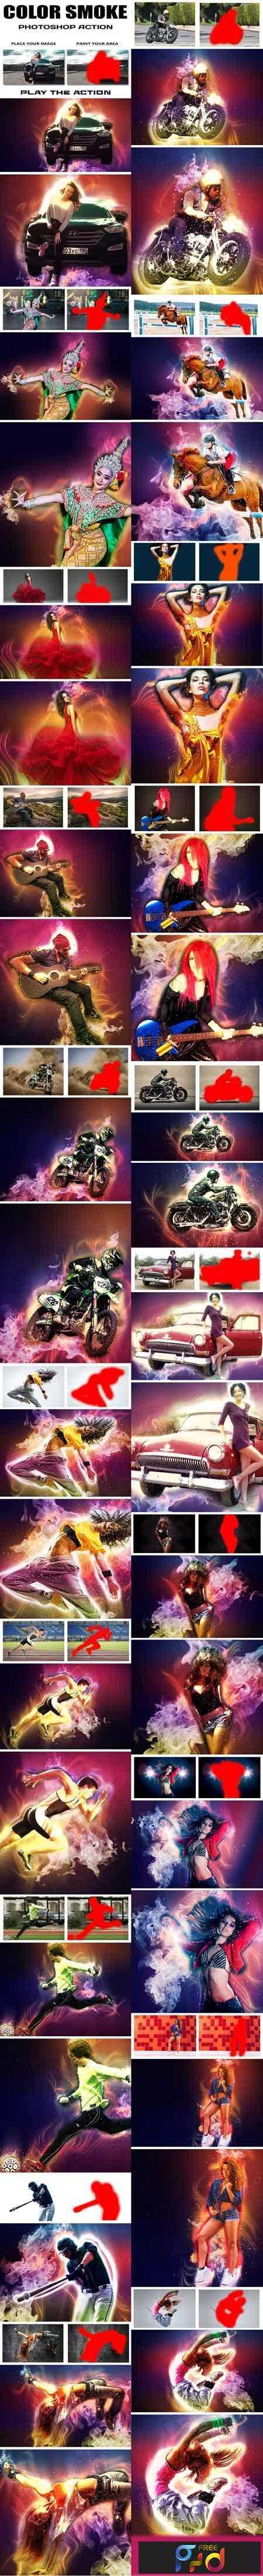 FreePsdVn.com_1705188_PHOTOSHOP_color_smoke_photoshop_action_20507852